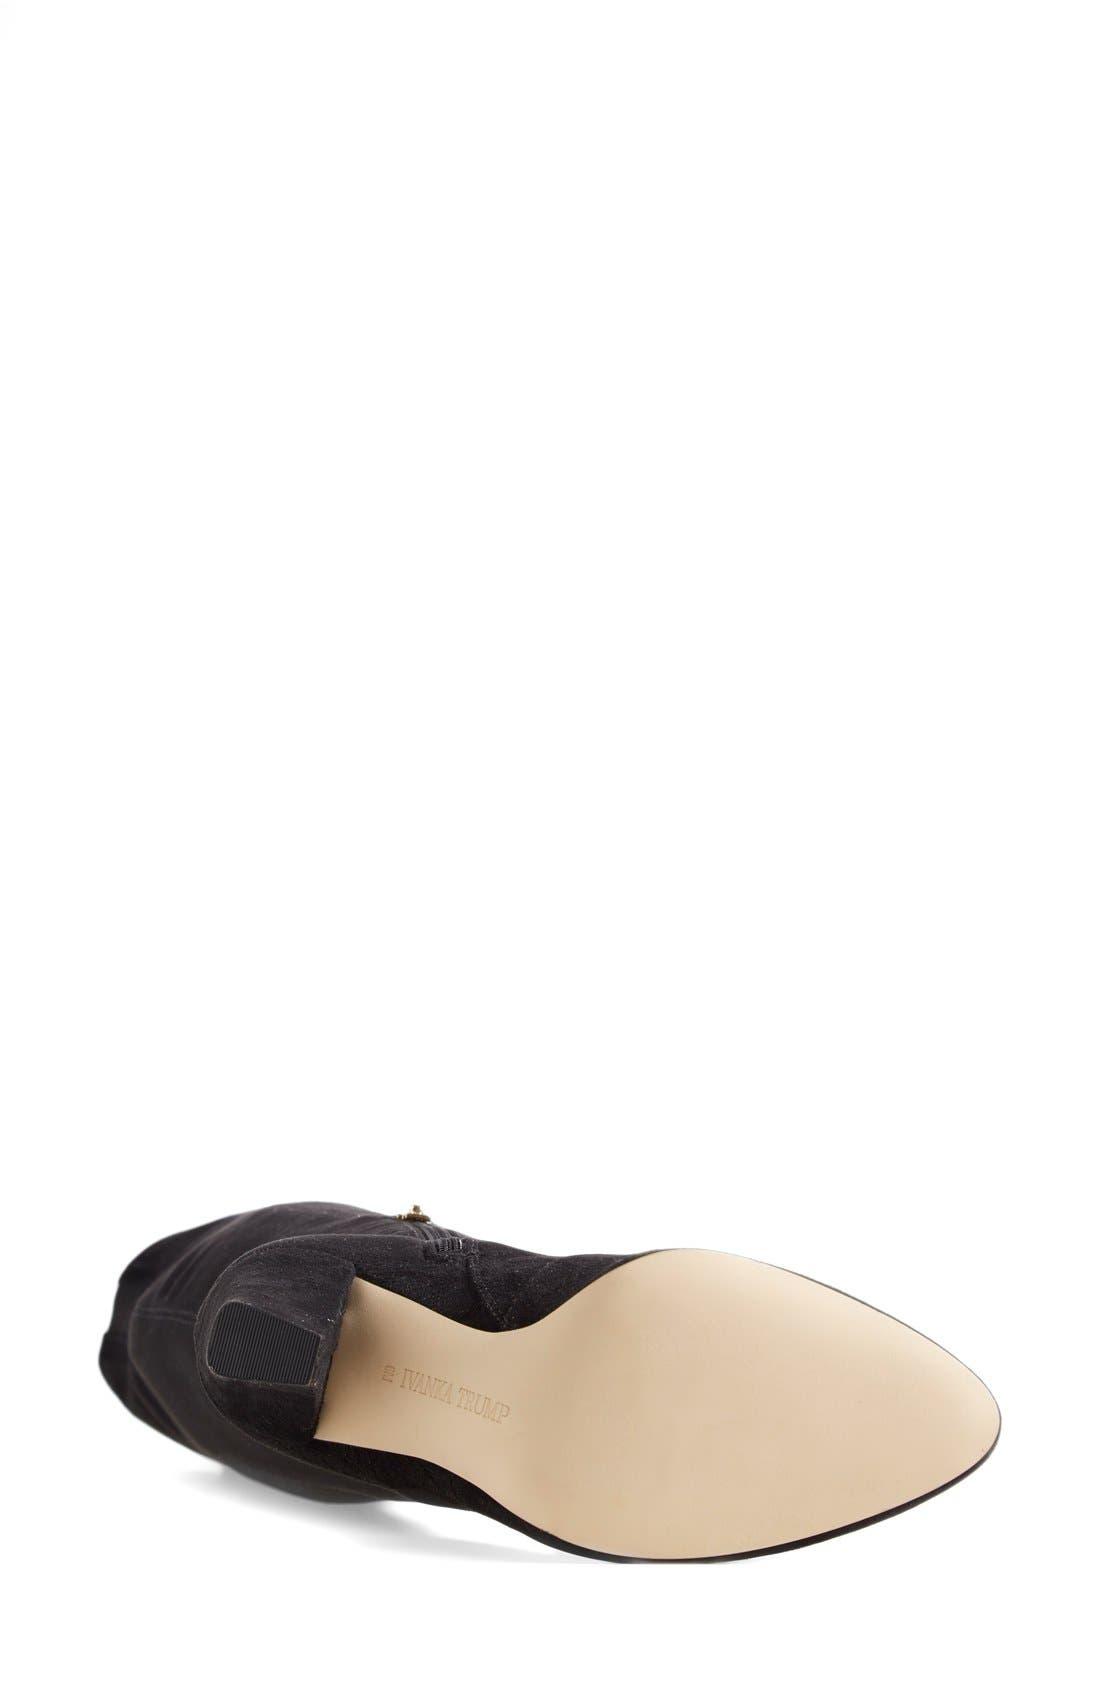 Alternate Image 4  - IvankaTrump 'Saffri' Over the Knee Suede Boot (Women)